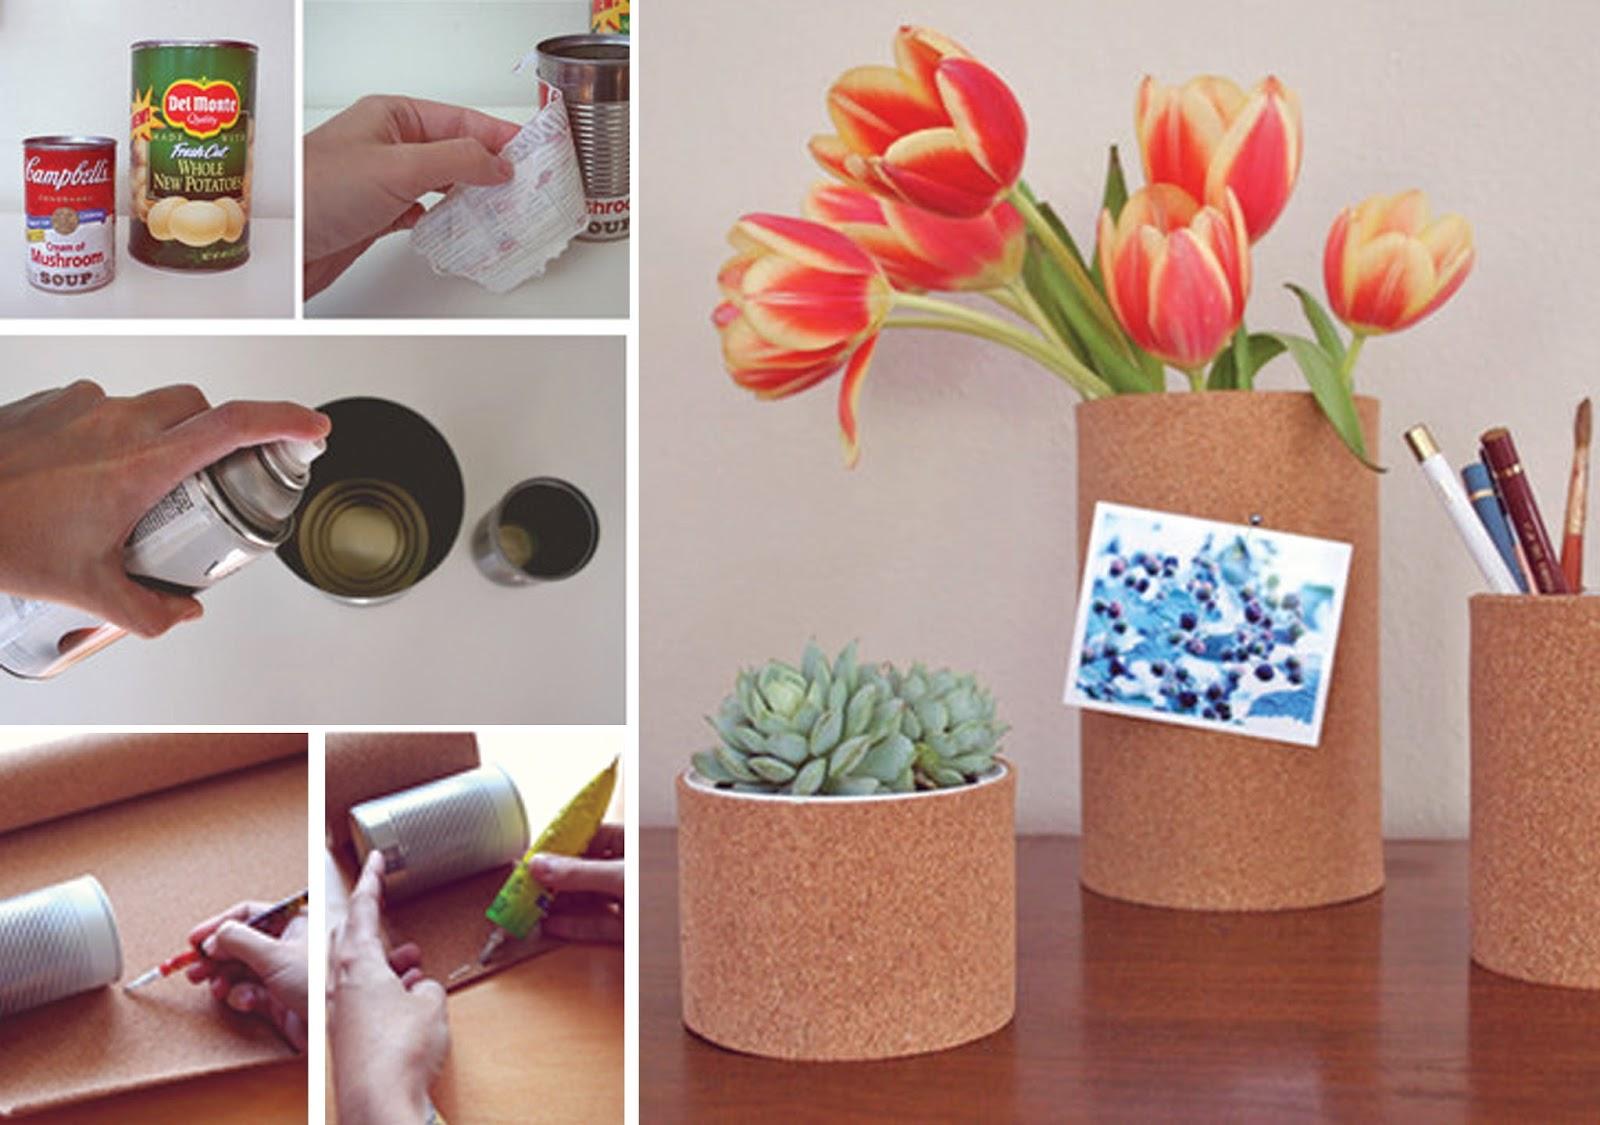 Homepersonalshopper blog decoraci n e ideas f ciles para - Manualidades para ninos faciles de hacer y rapidas ...